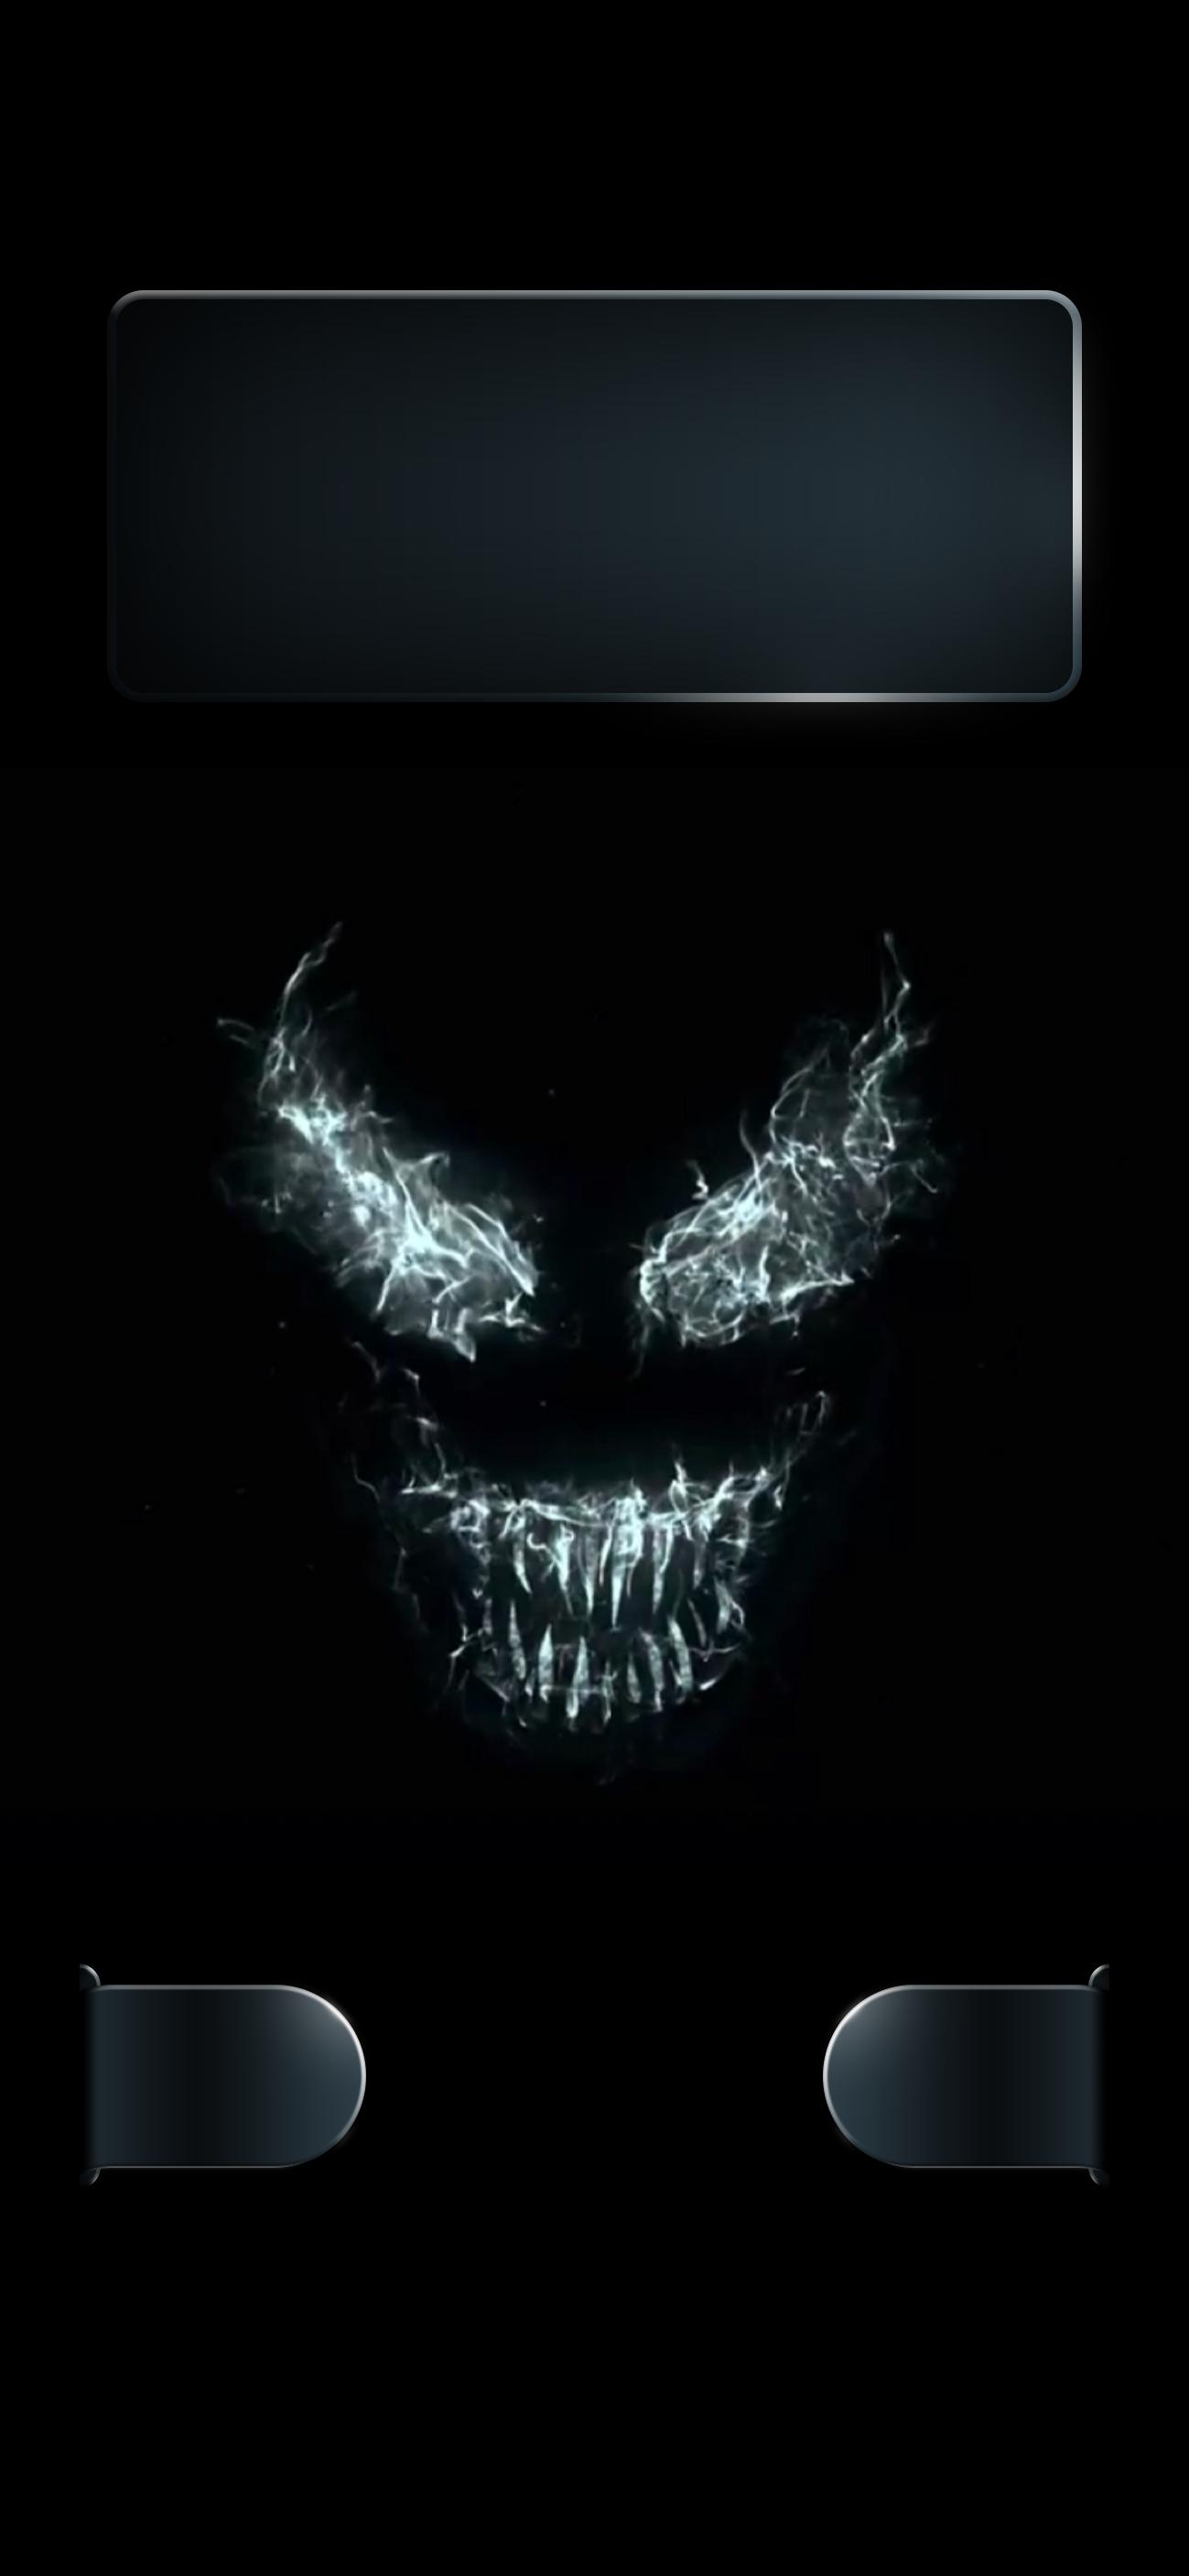 ... Venom Wallpaper Hd Iphone X floweryred2 com